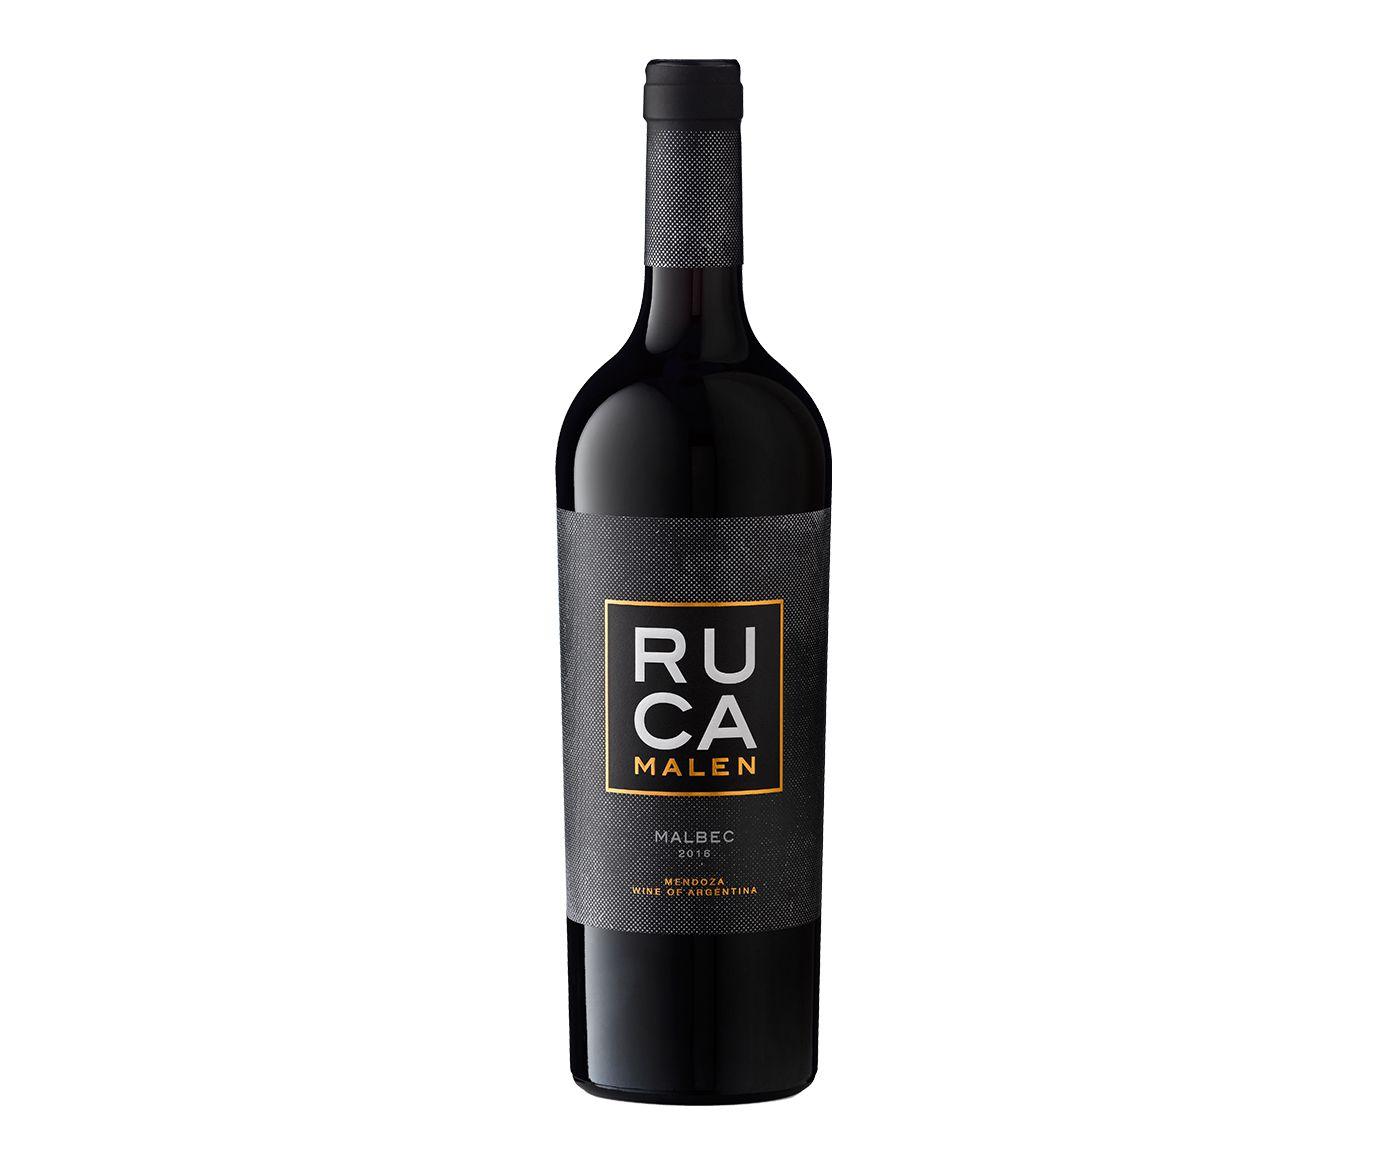 Vinho Tinto Ruca Malen Malbec - 750ml   Westwing.com.br